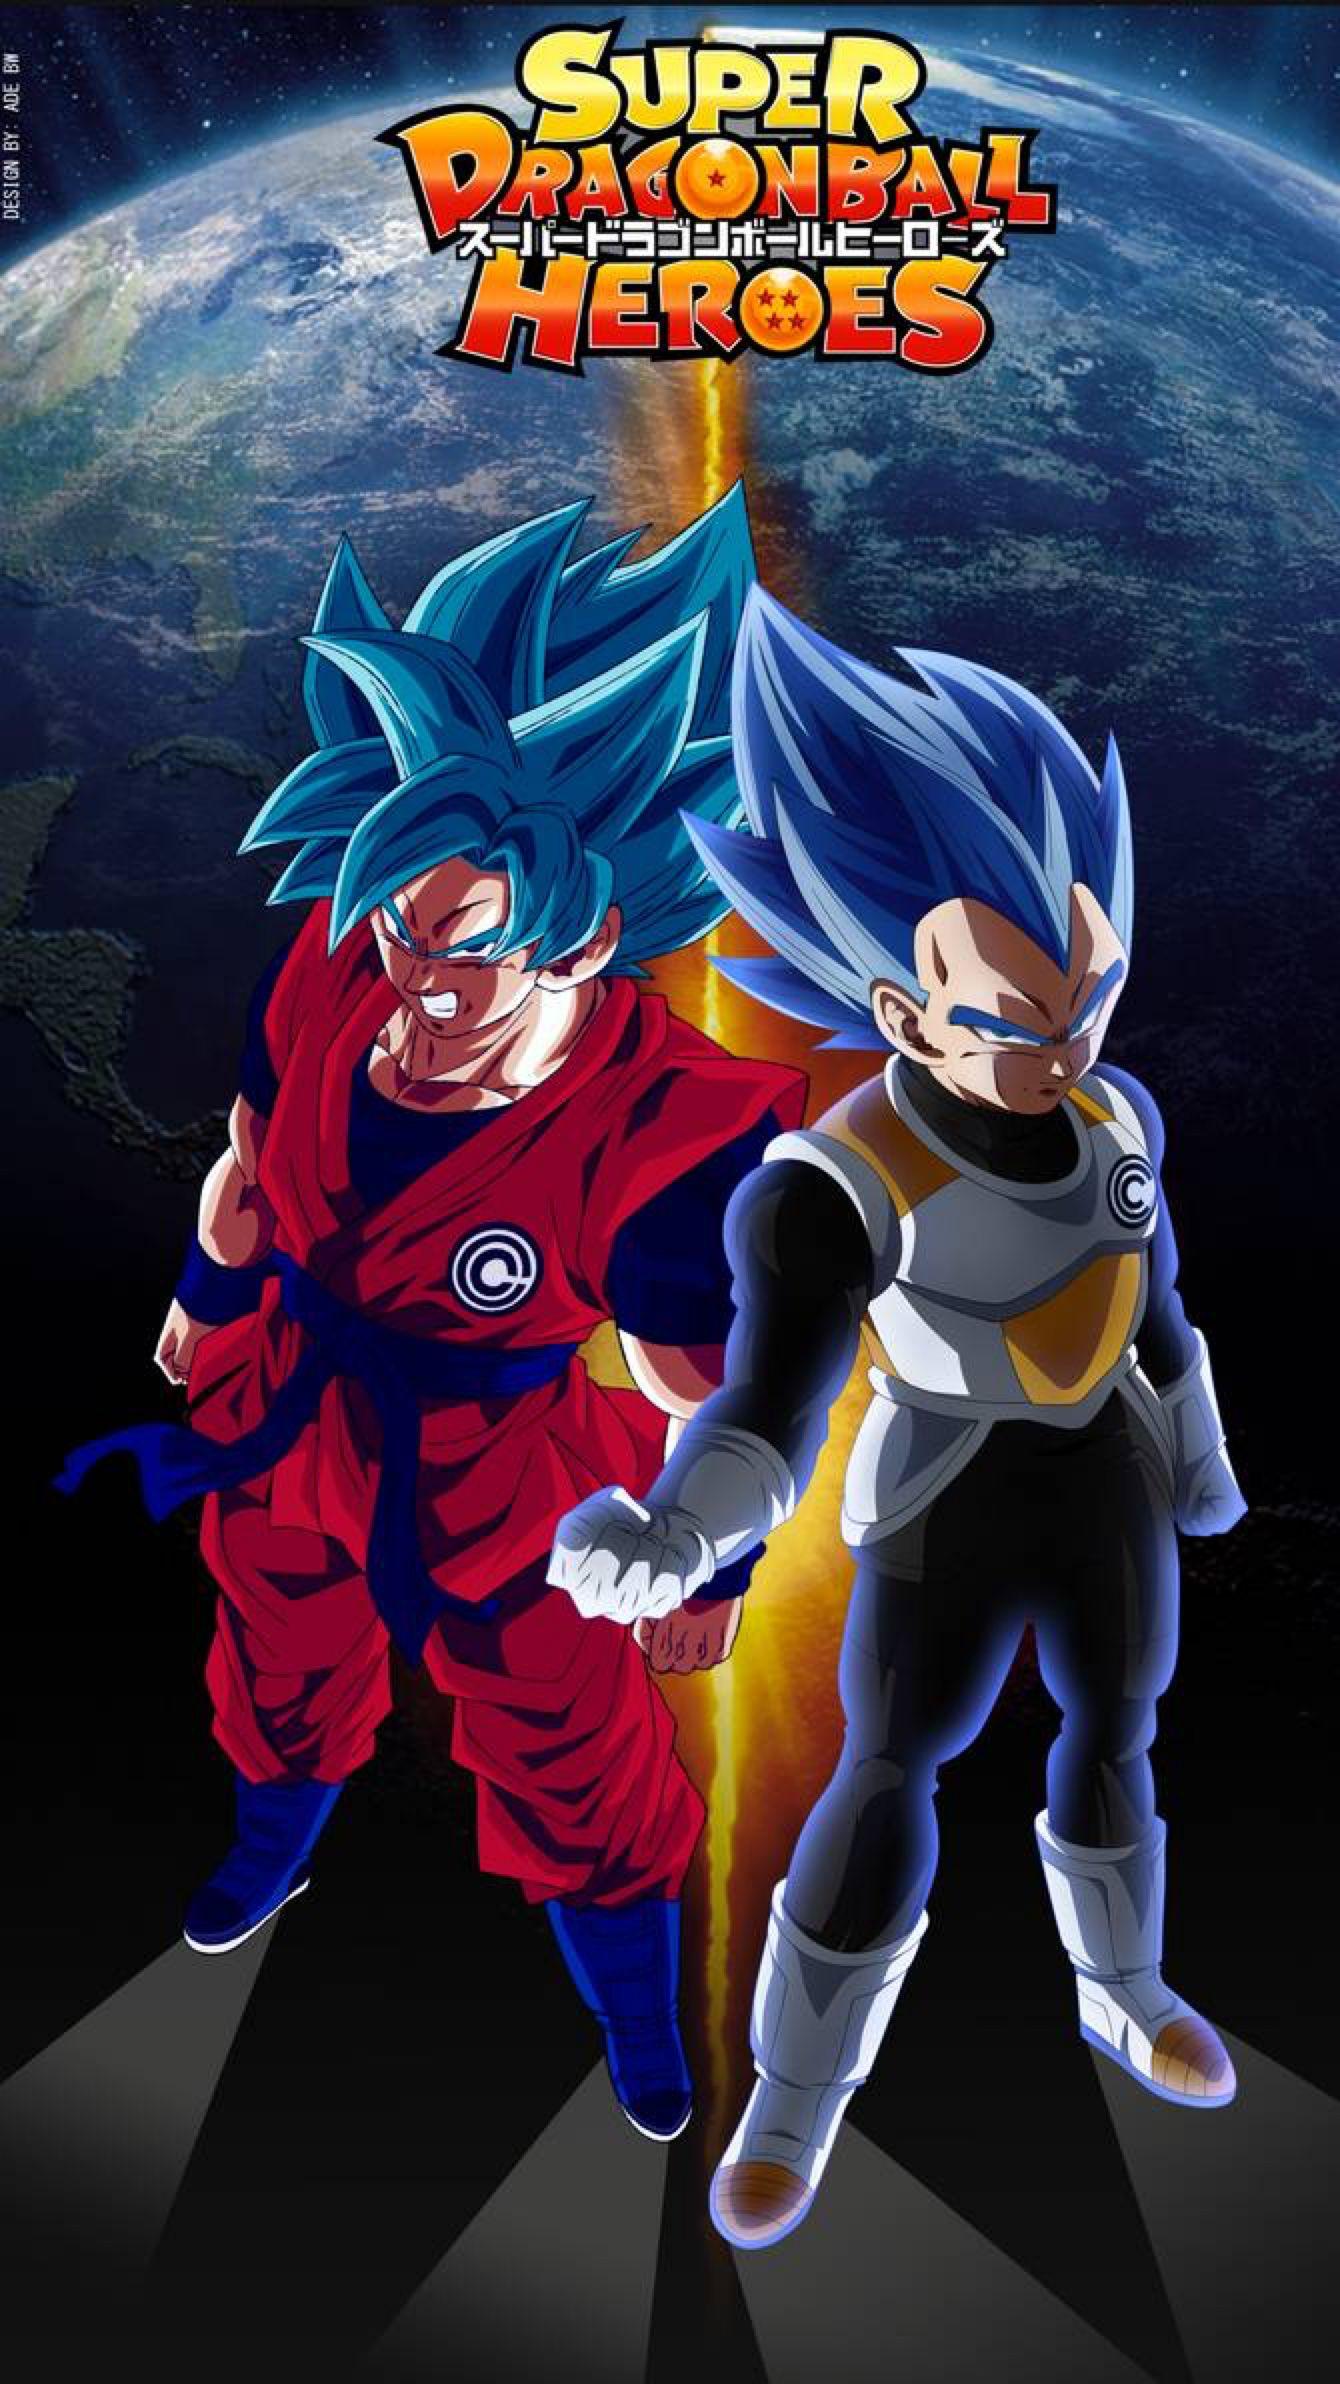 Goku And Vegeta Hero By Adb3388 On Deviantart Anime Dragon Ball Super Dragon Ball Super Art Dragon Ball Super Goku